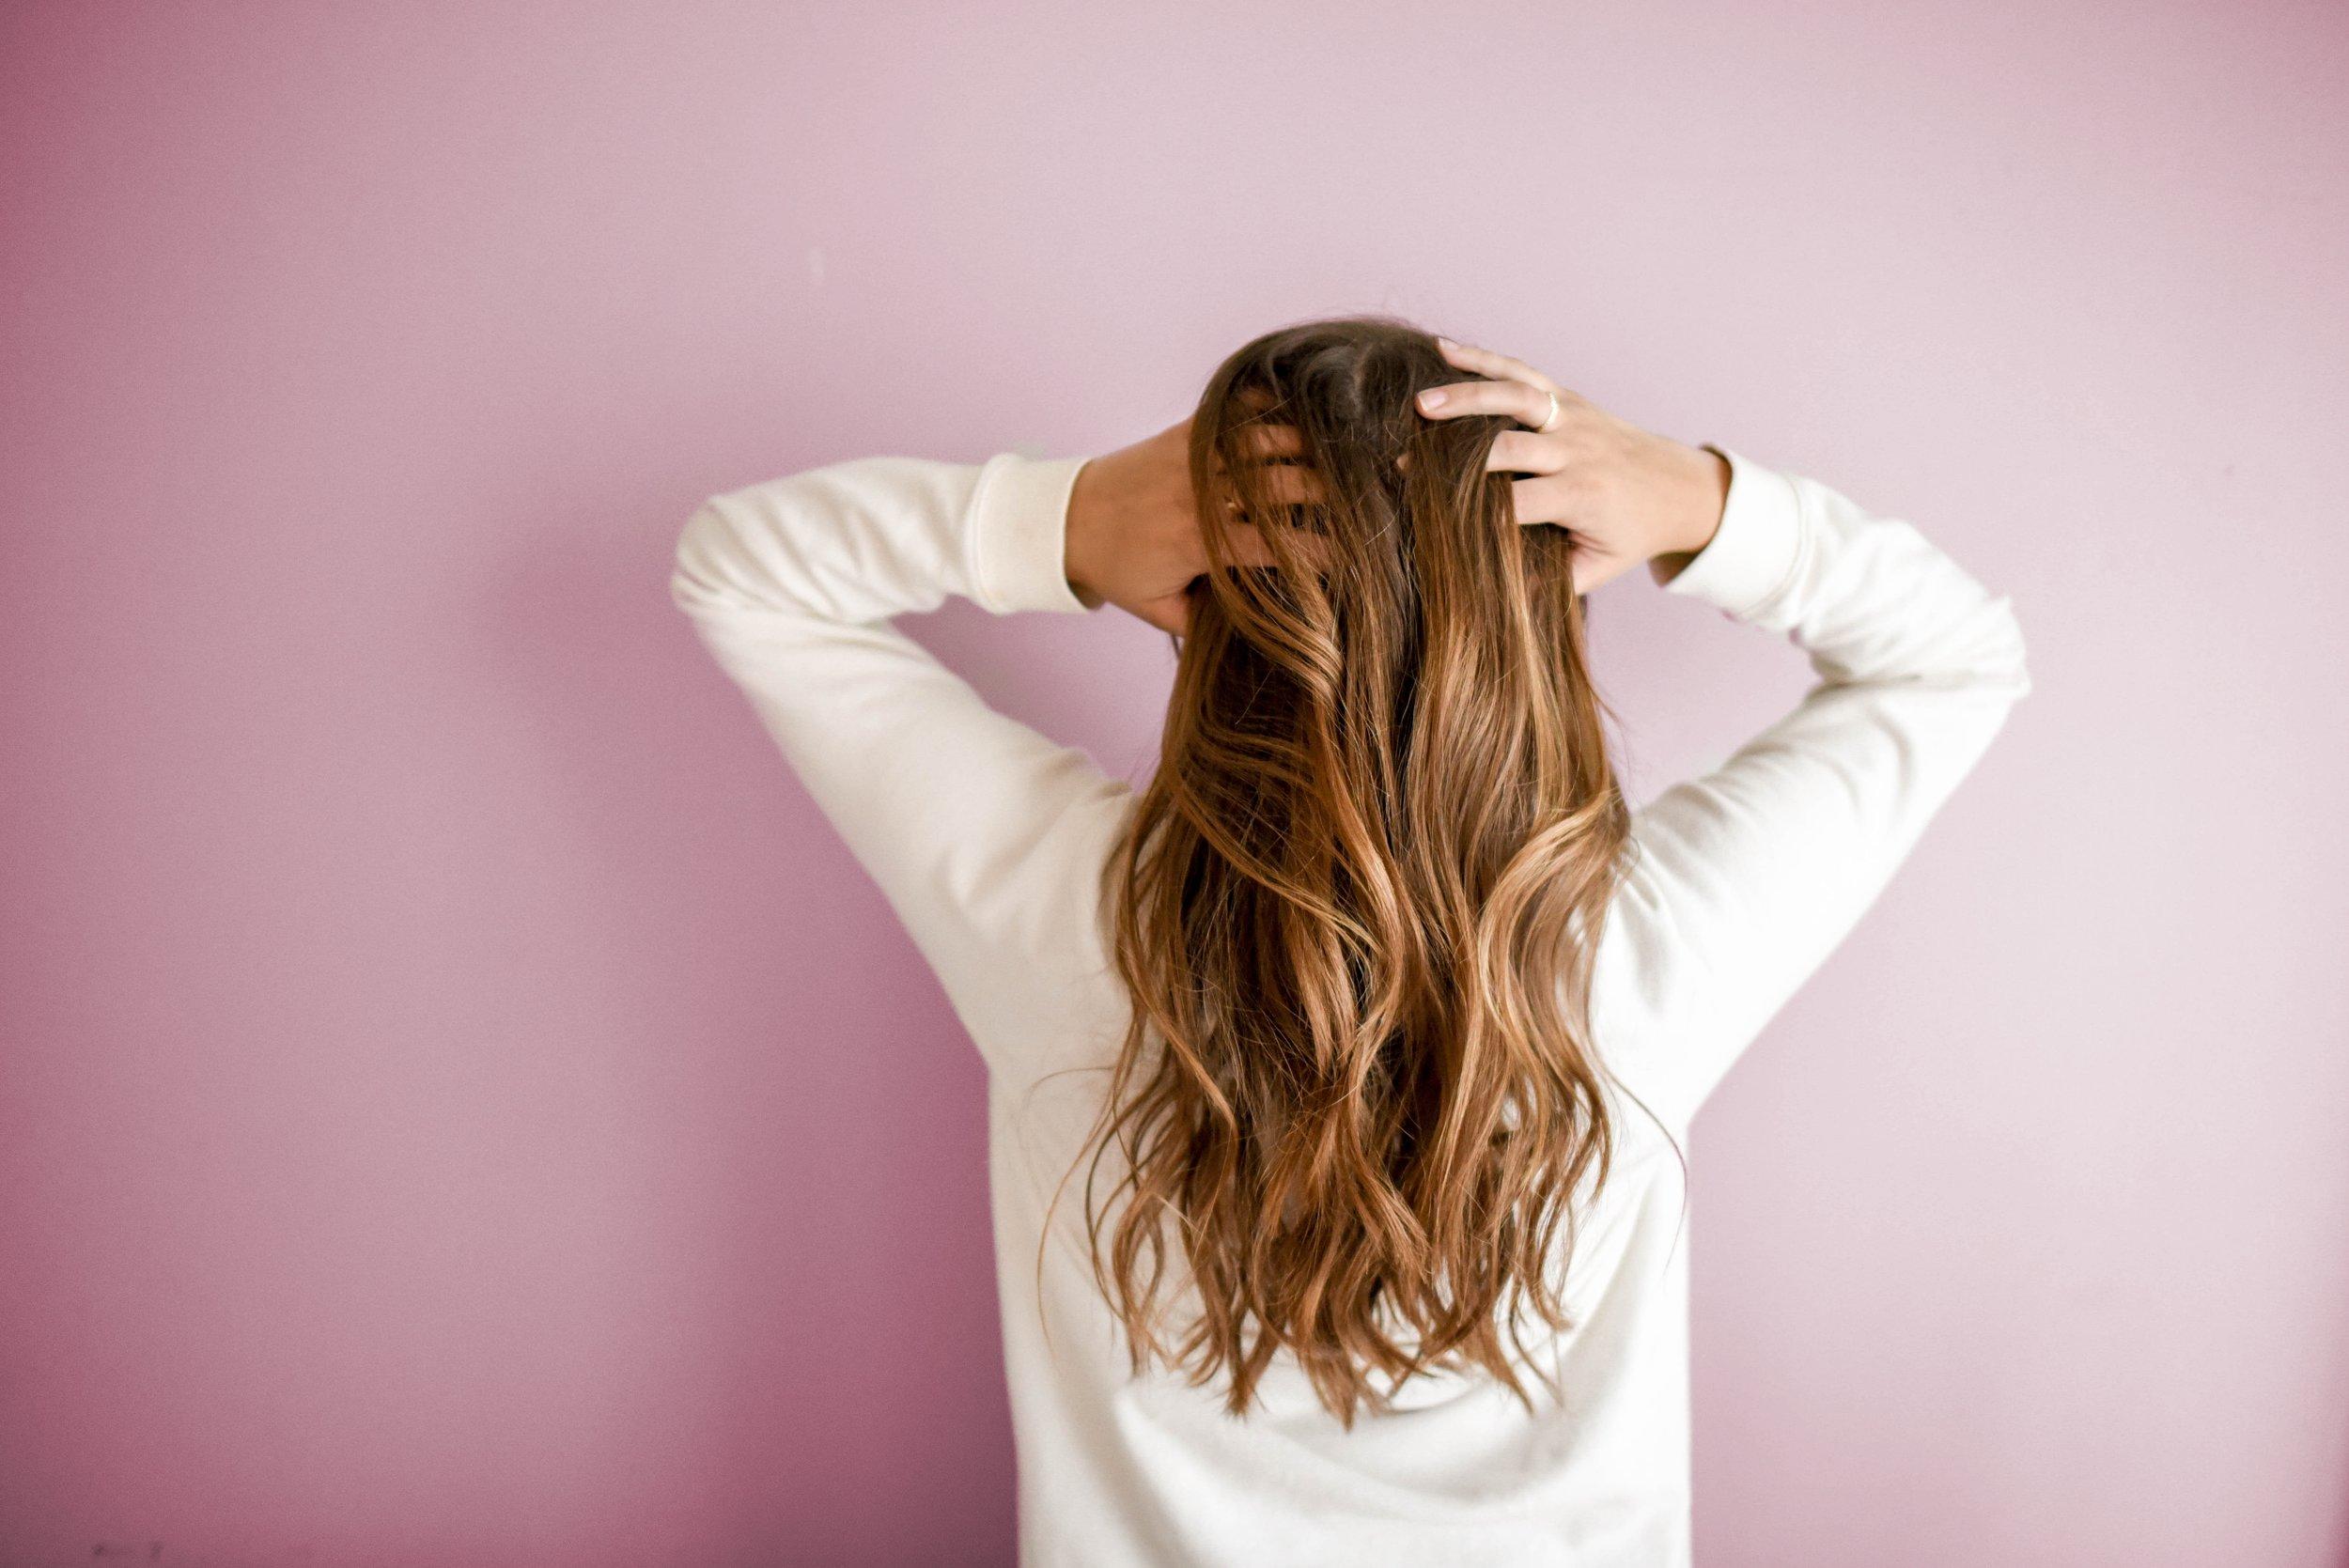 hair-winter-Minneapolis-salon.jpg